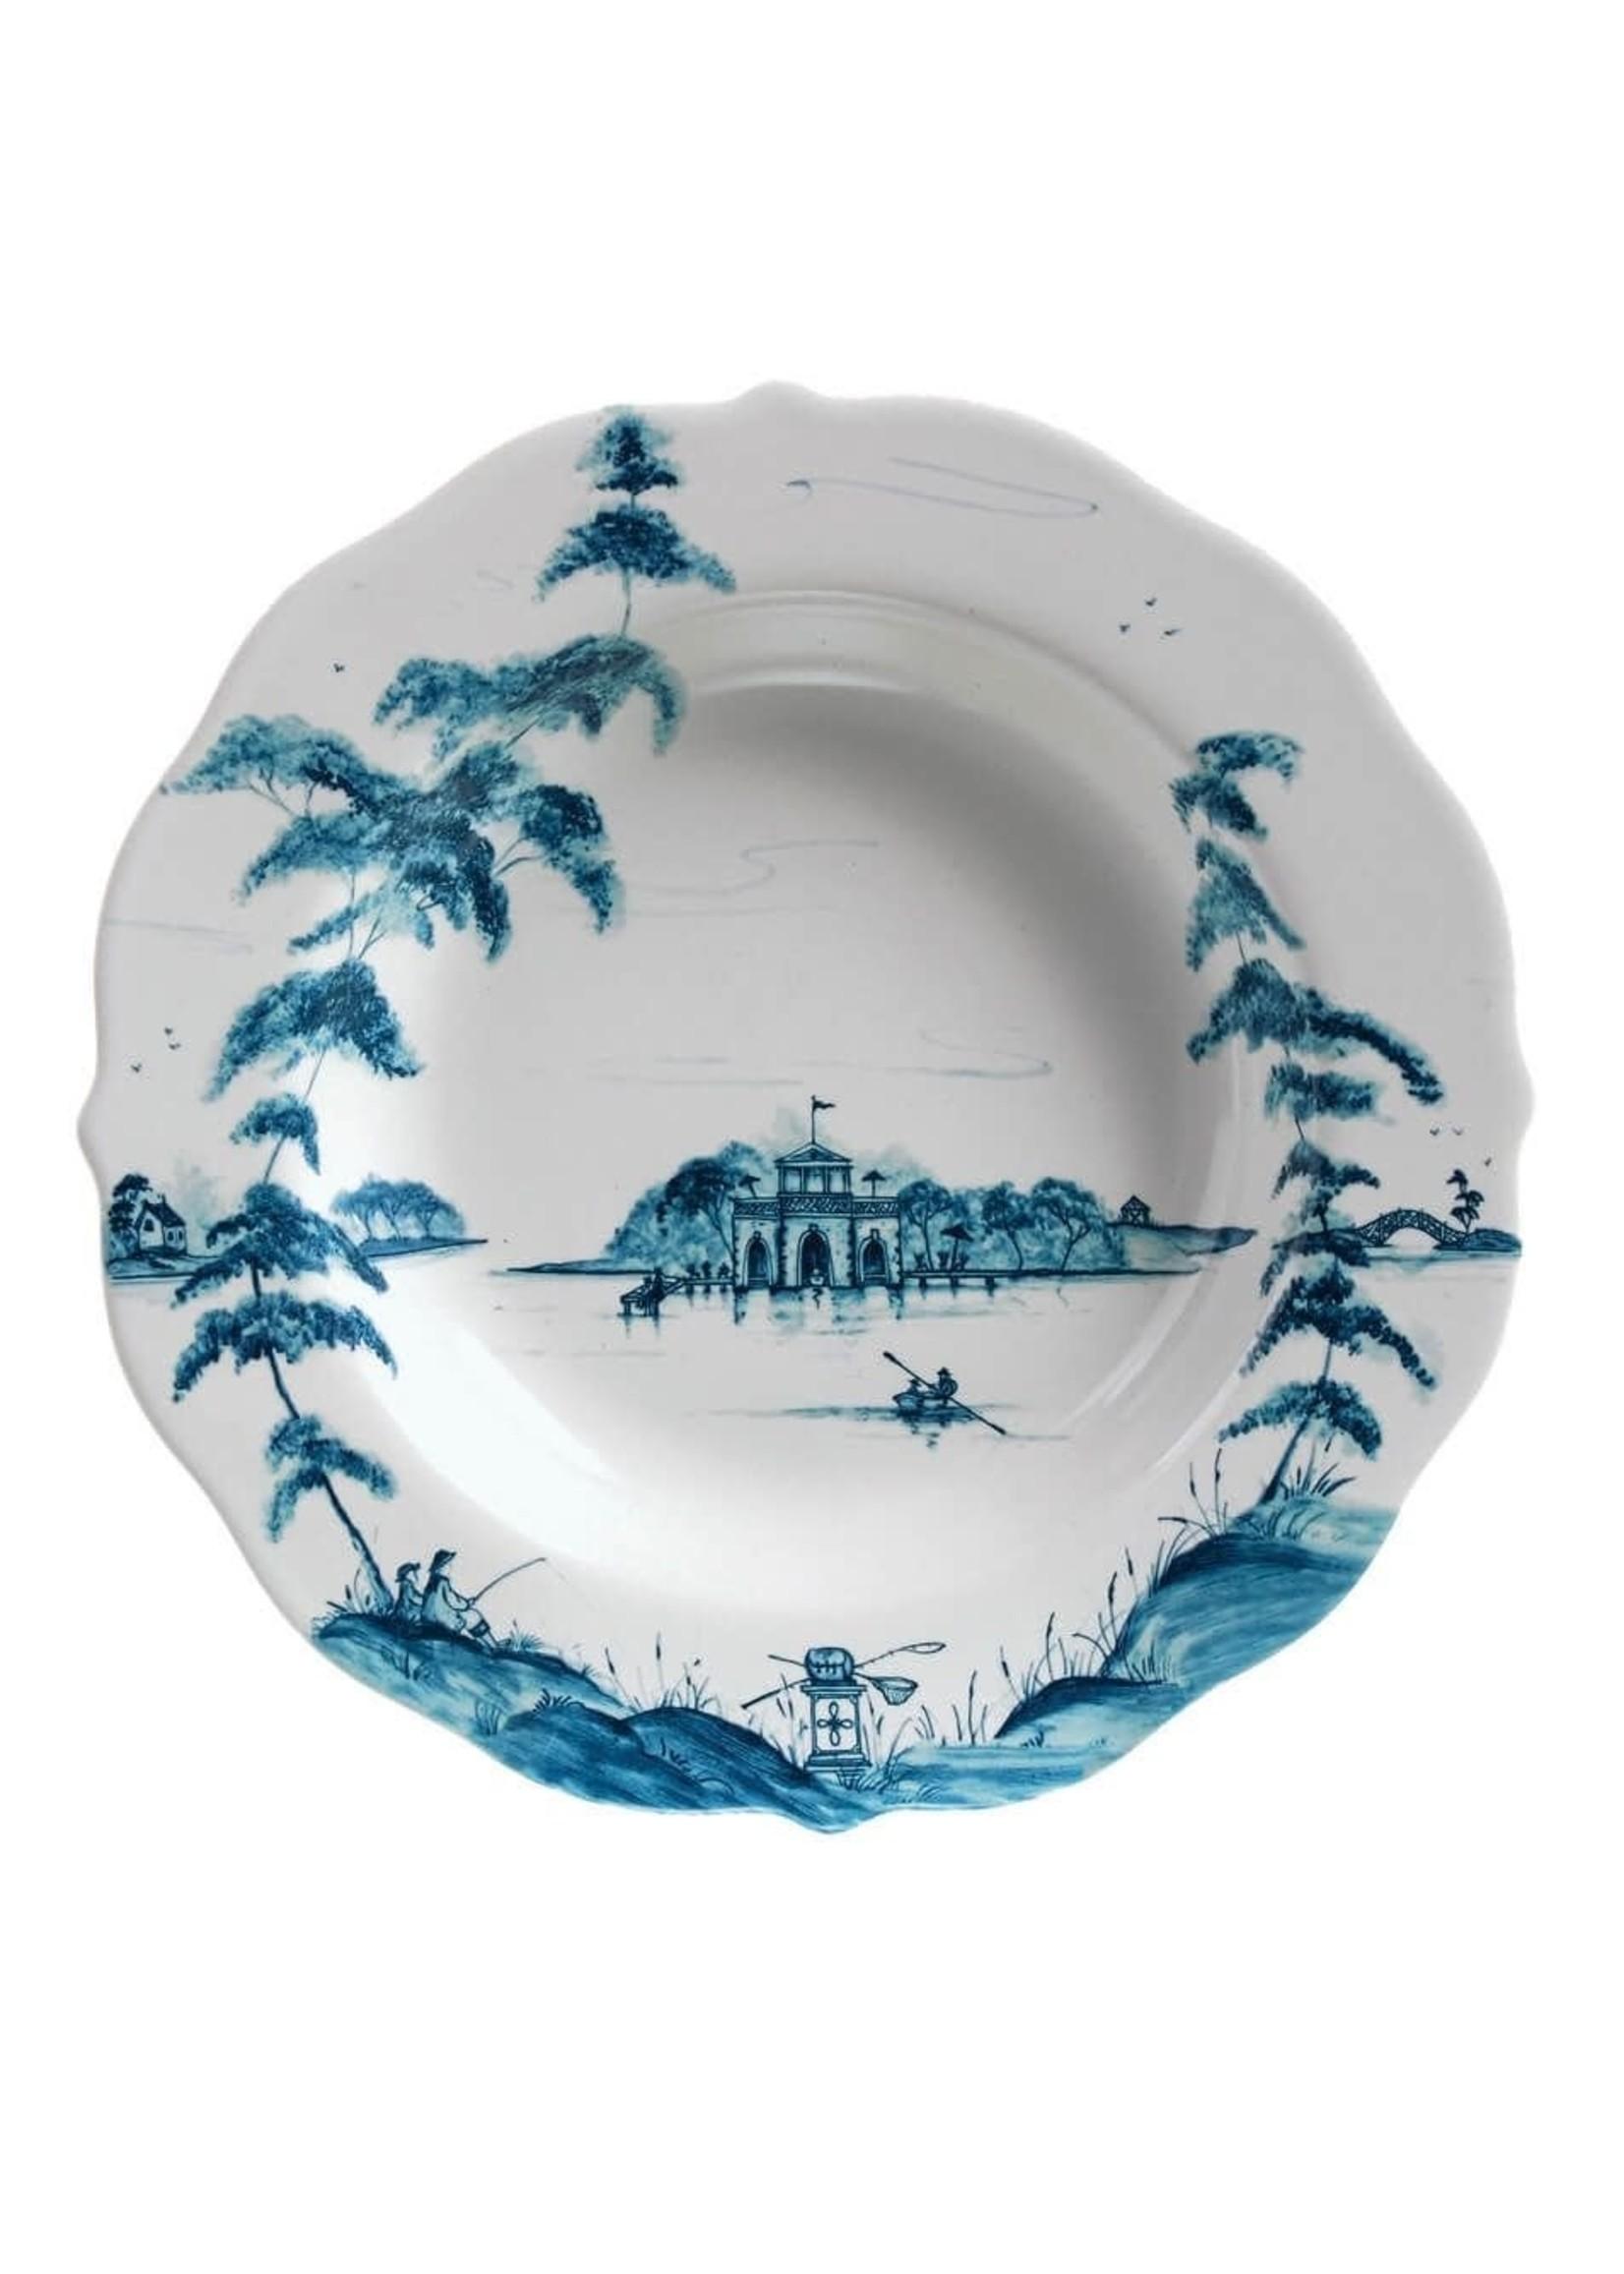 Juliska Country Estate Delft Pasta/Soup Bowl Boathouse